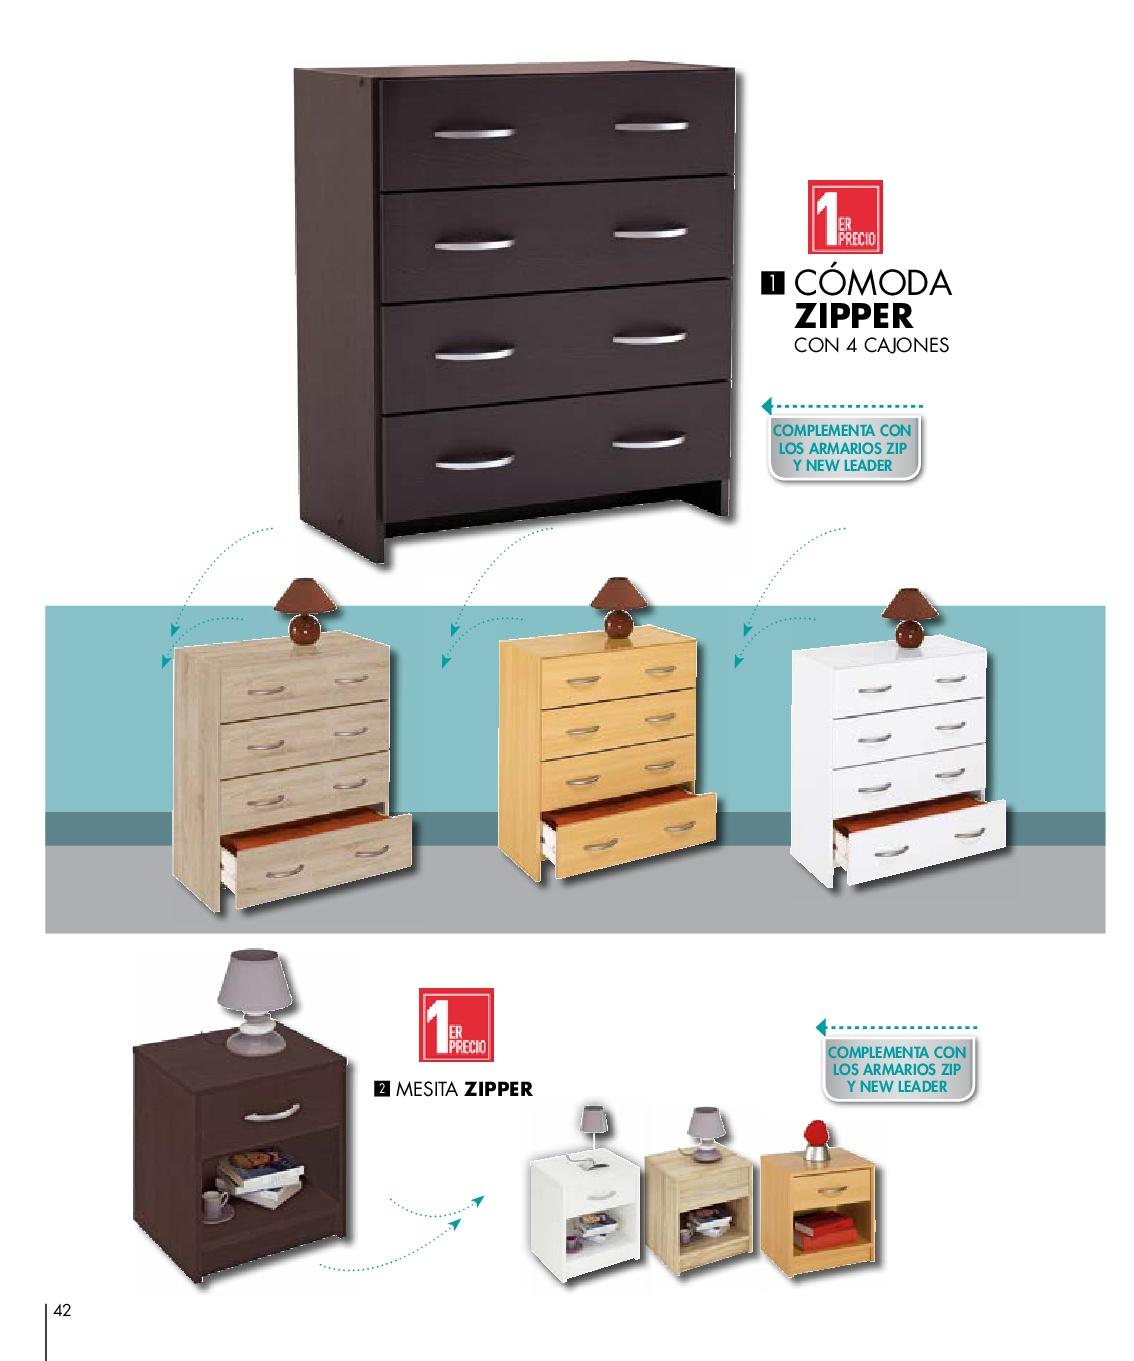 Conforama armarios 201642 - Catalogo armarios conforama ...